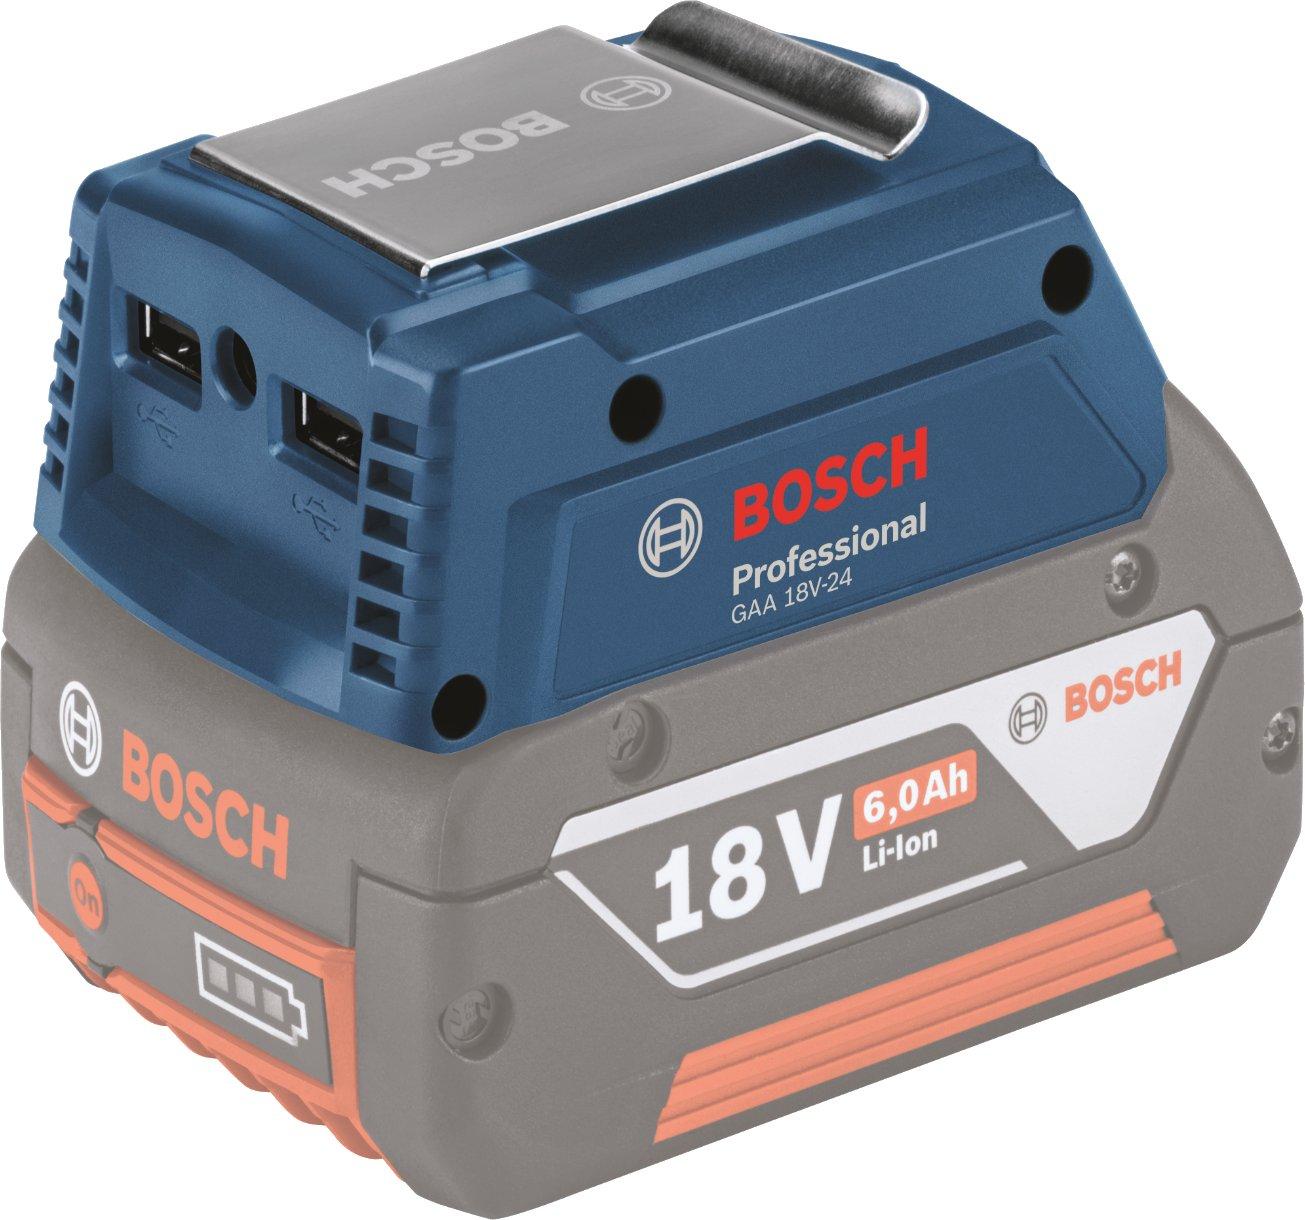 [Werkzeugblitz über idealo] Bosch Ladegerät GAA 18 V-24 - Bosch Akkus als Powerbank